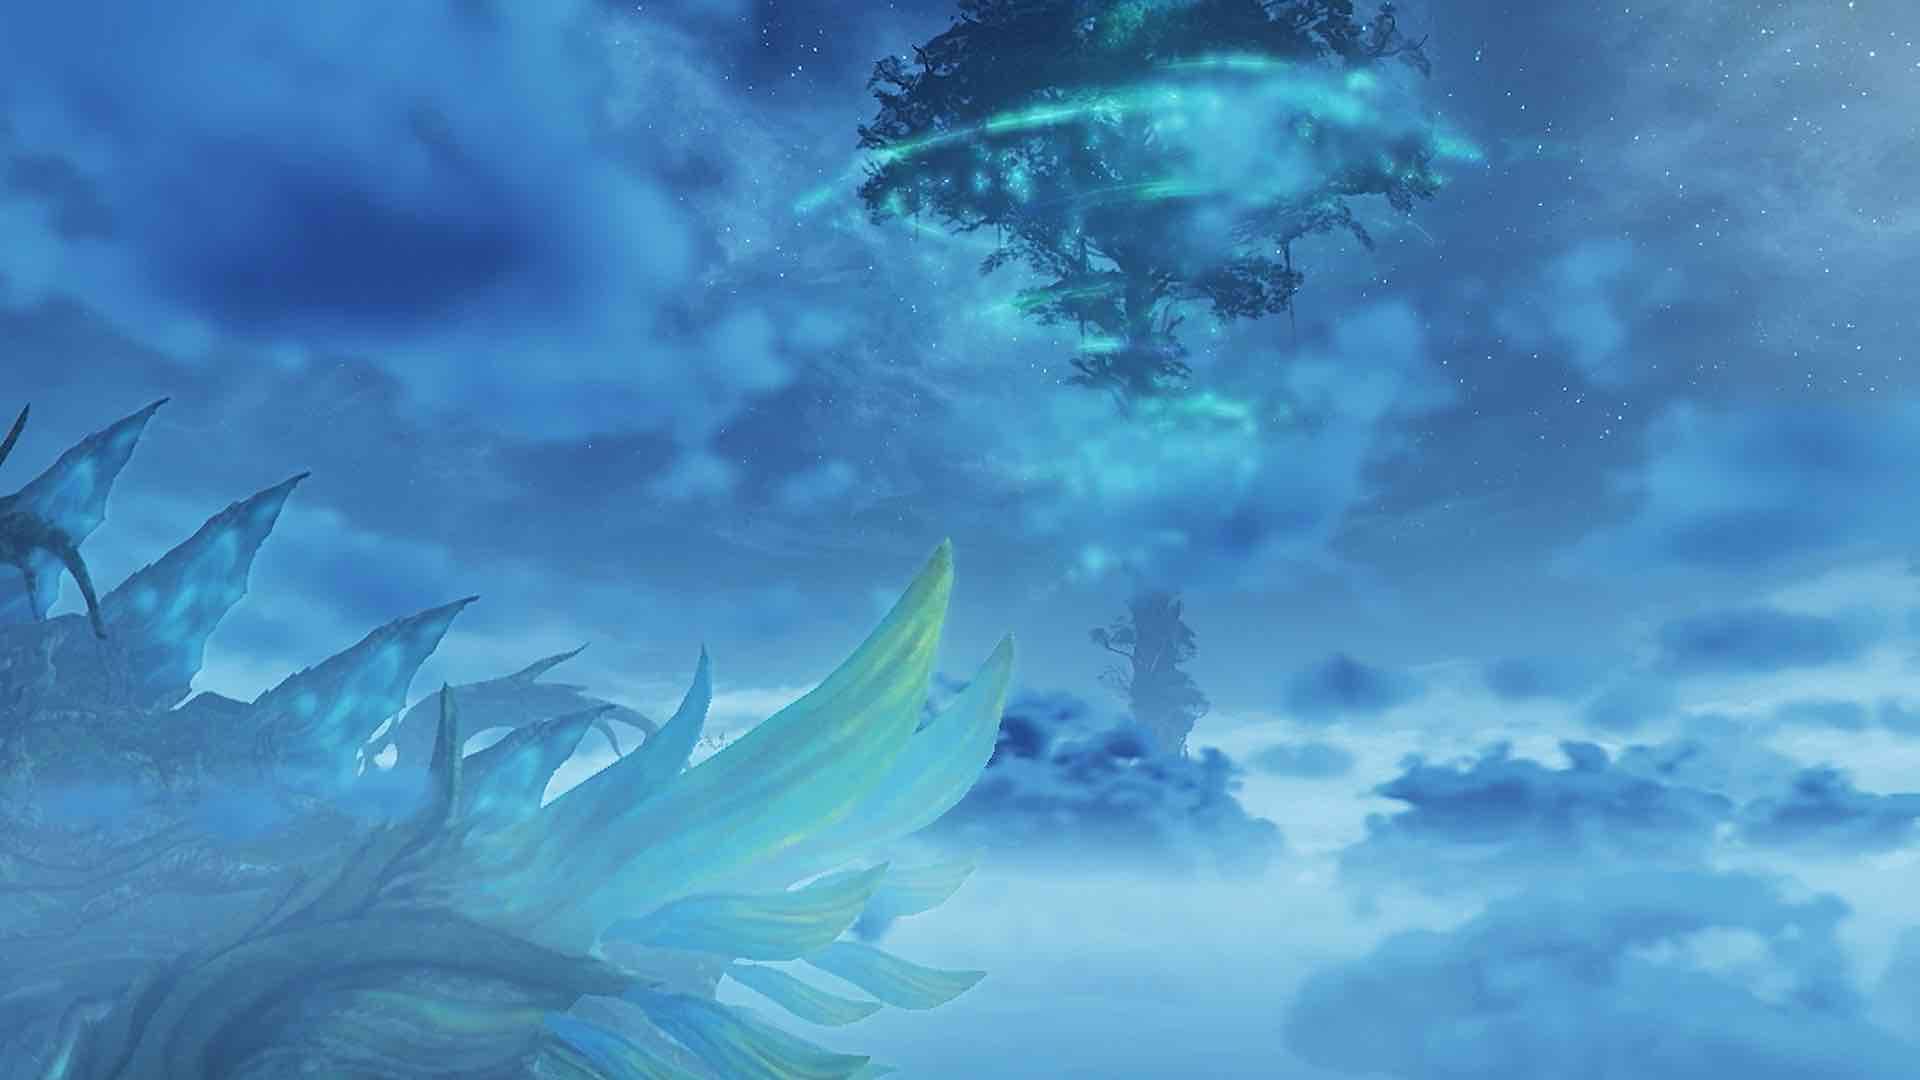 xenoblade-chronicles-2-nintendo-direct-screenshot-3